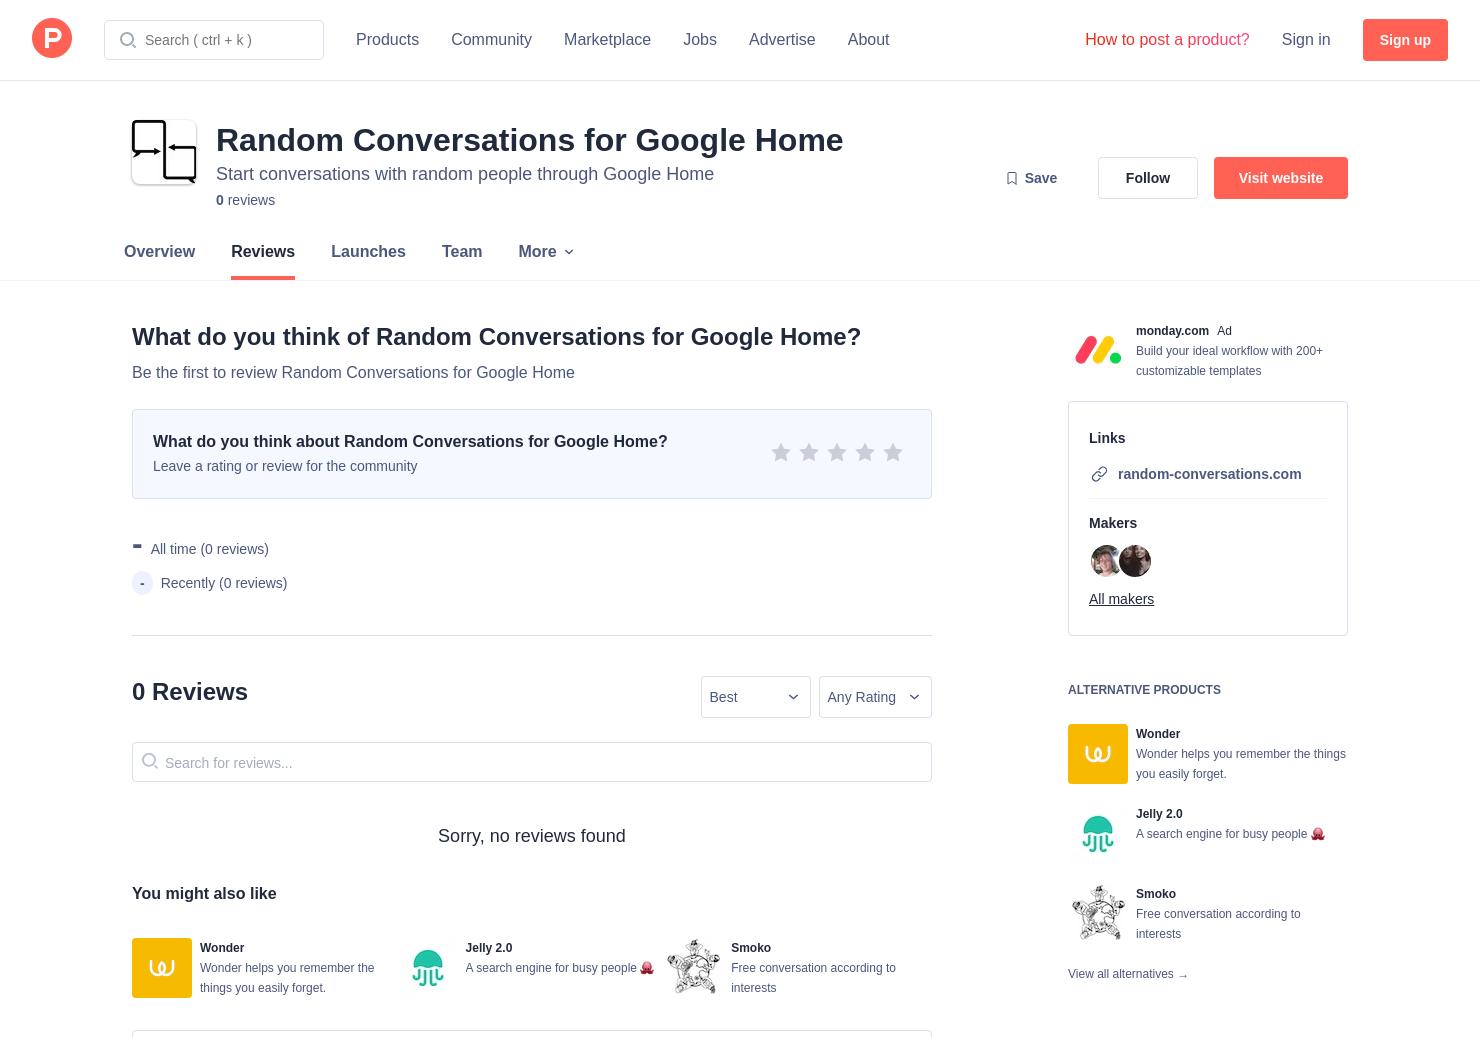 Random Conversations for Google Home Reviews - Pros, Cons and Rating